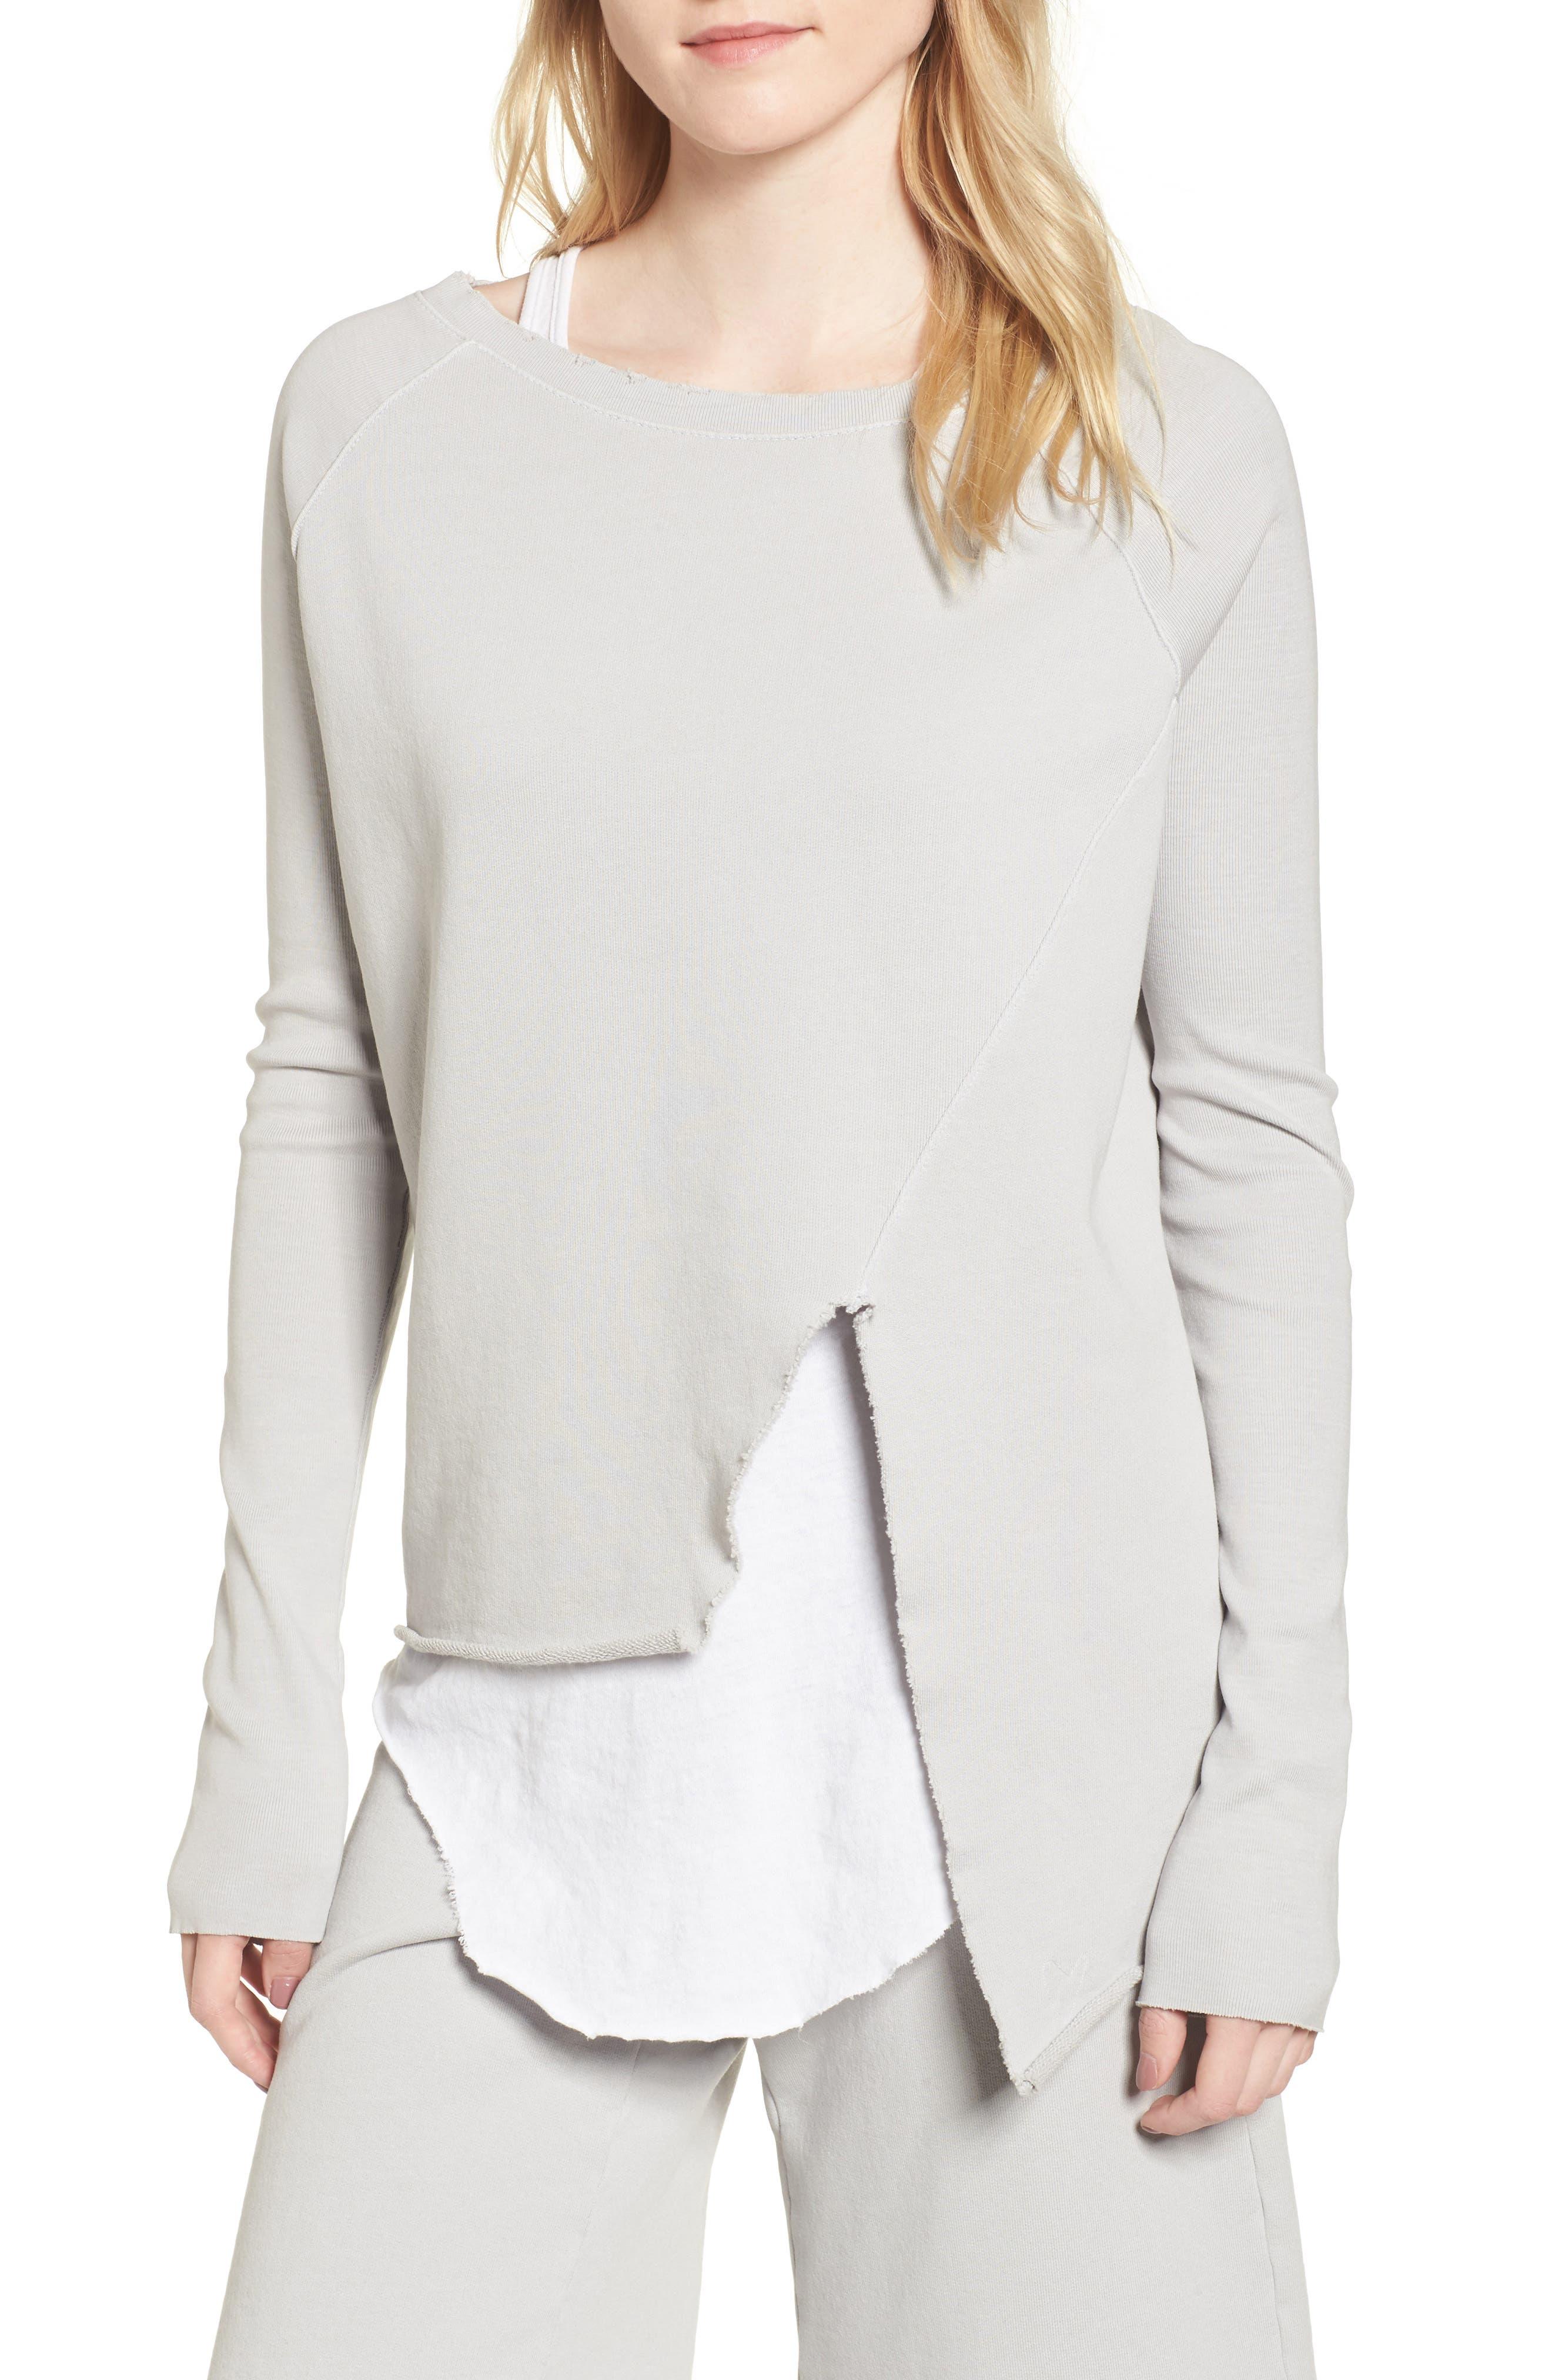 Main Image - Frank & Eileen Tee Lab Asymmetric Sweatshirt